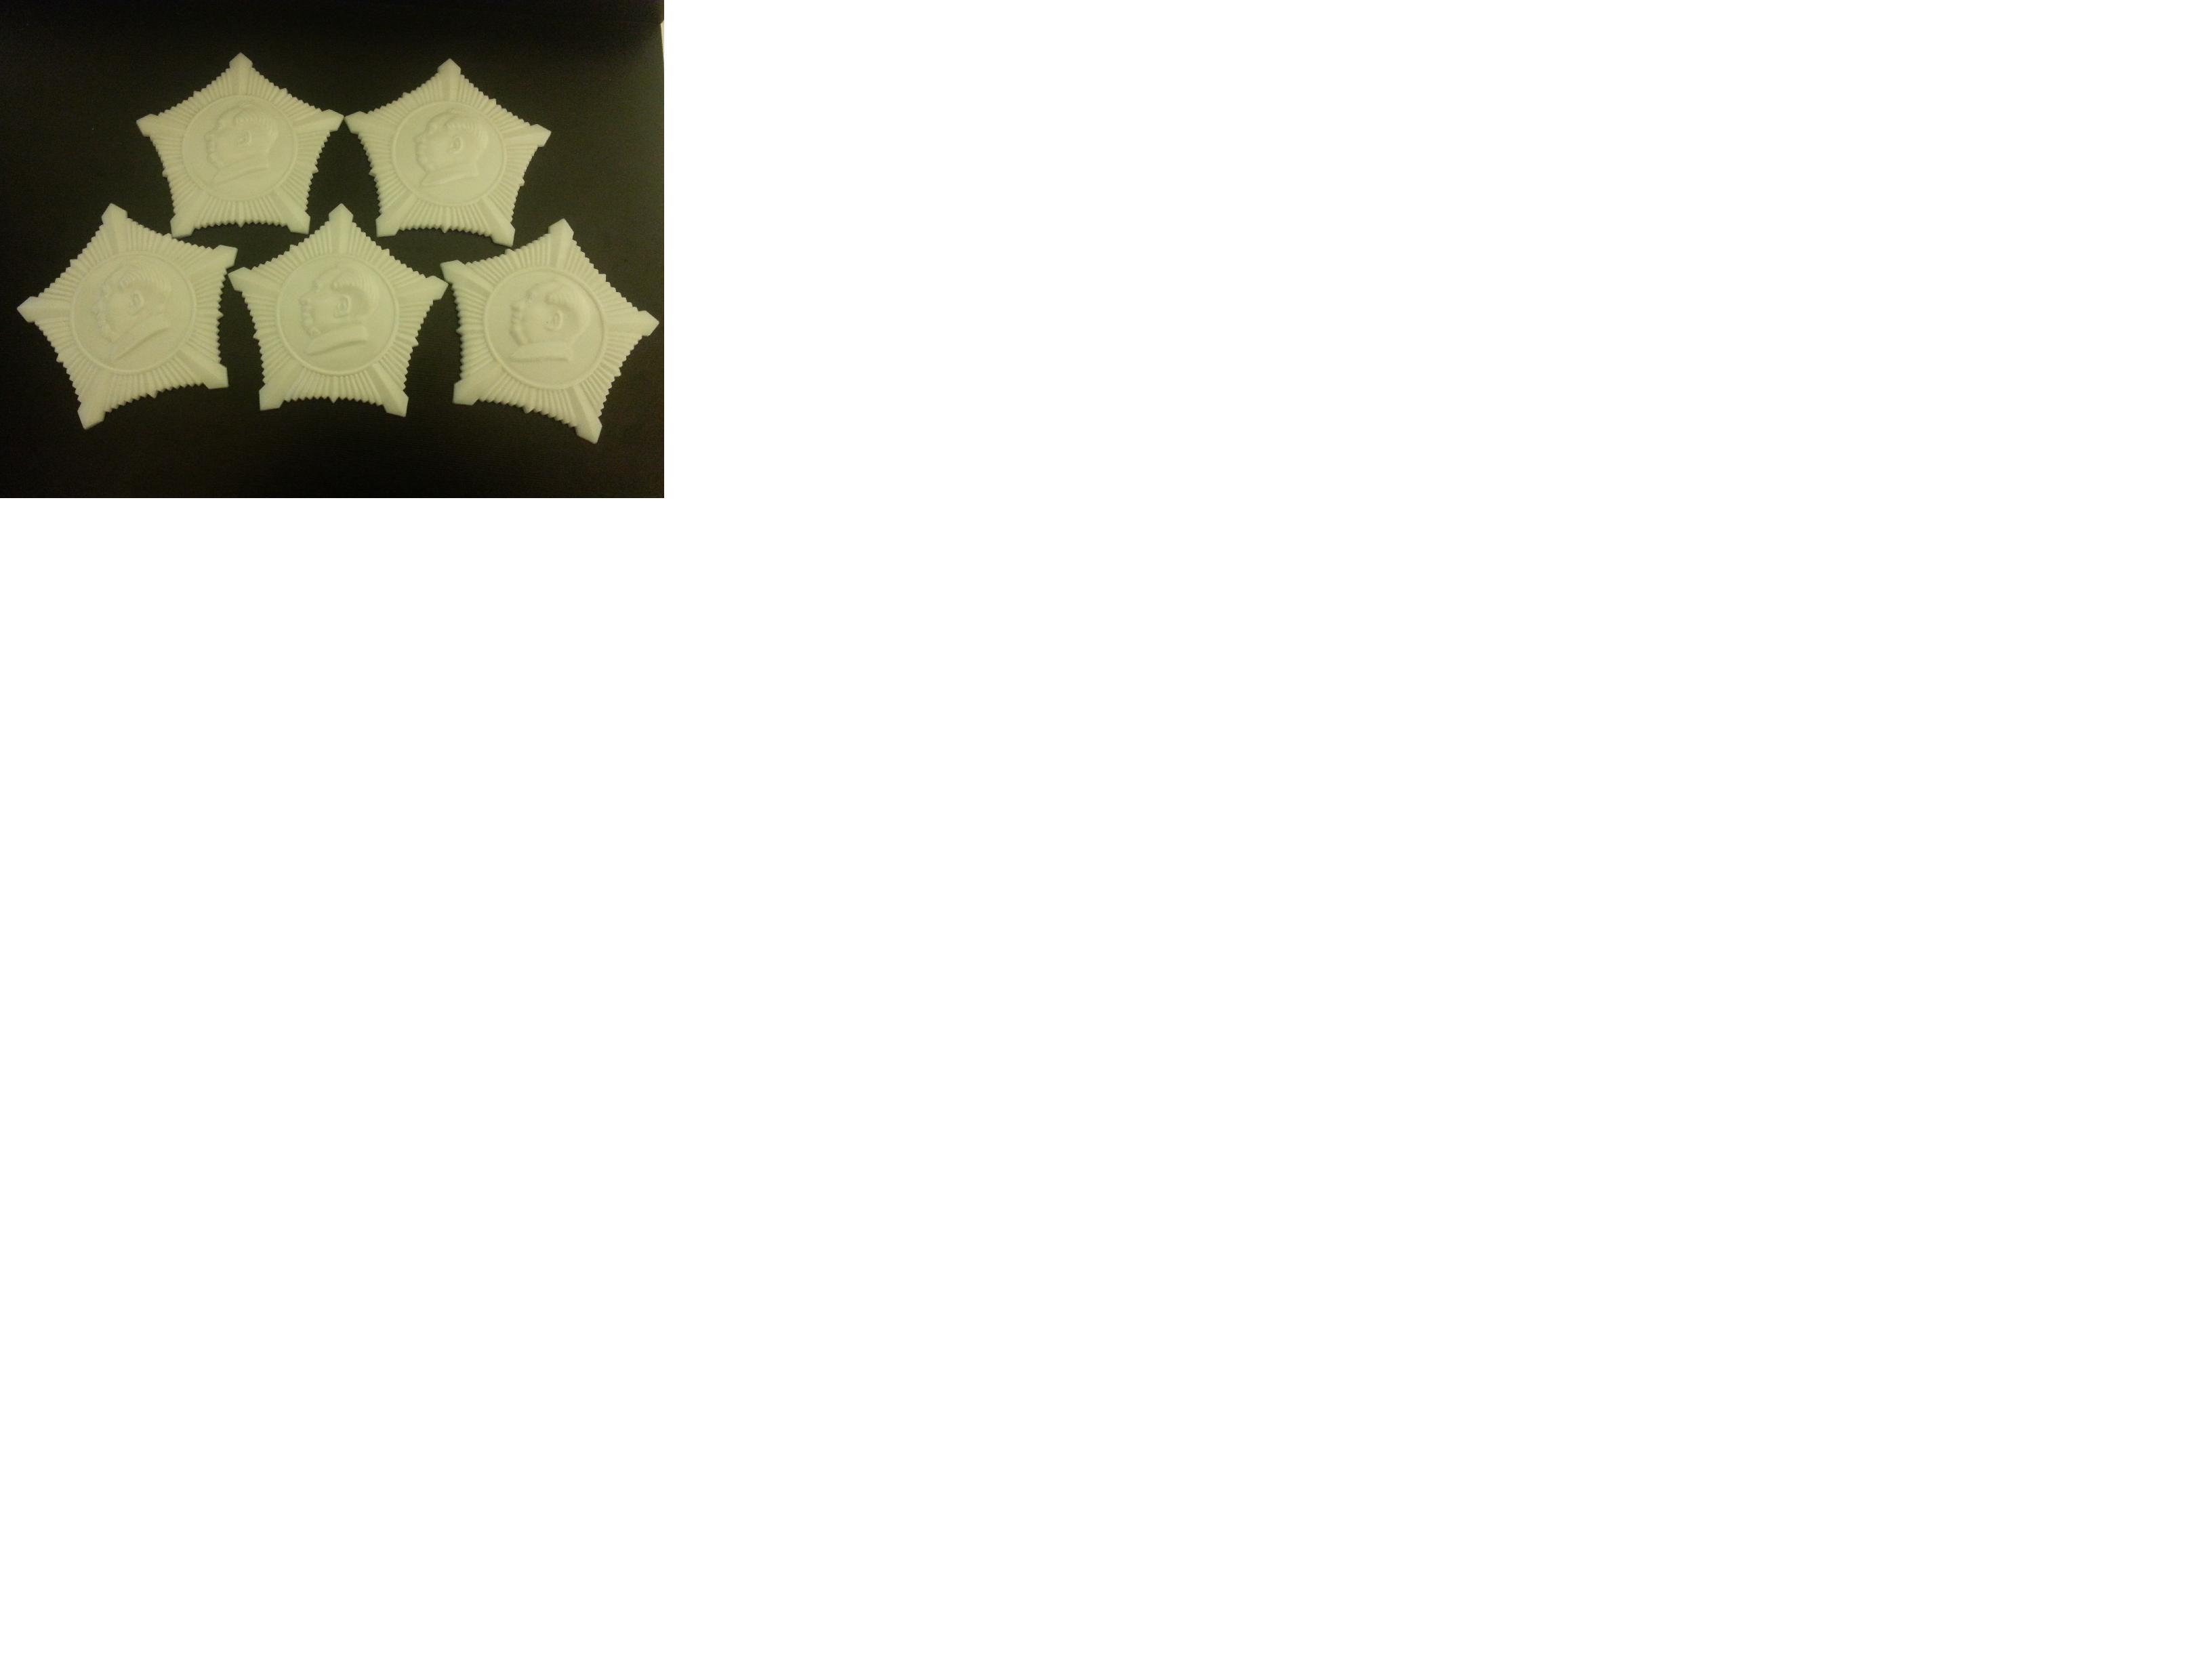 ppt 背景 背景图片 边框 模板 设计 矢量 矢量图 素材 相框 3264_2448